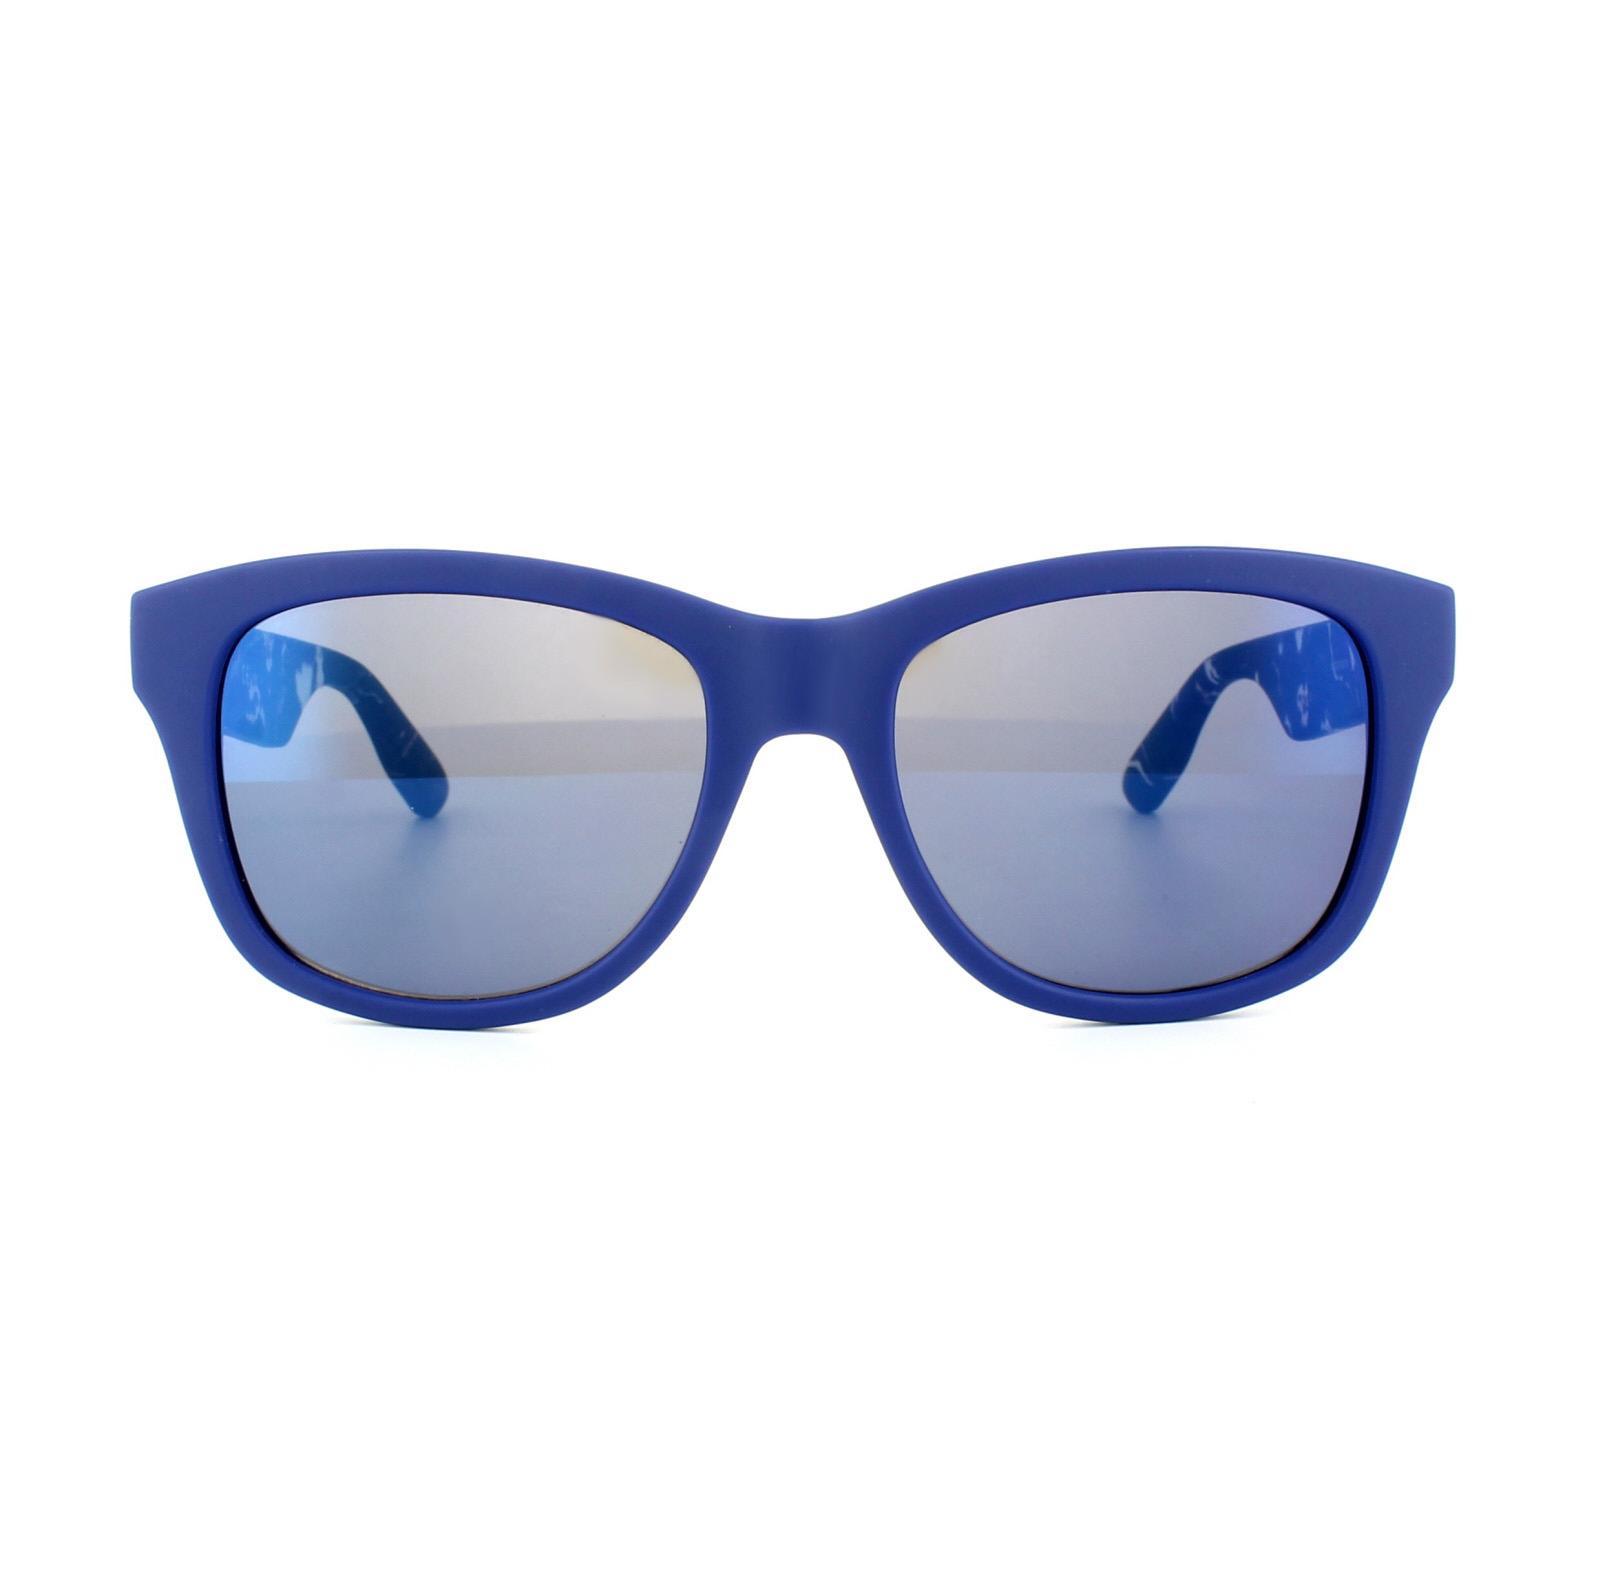 McQ Alexander McQueen Occhiali da sole 0002//s OTTIMI XT Blue Marble Blu